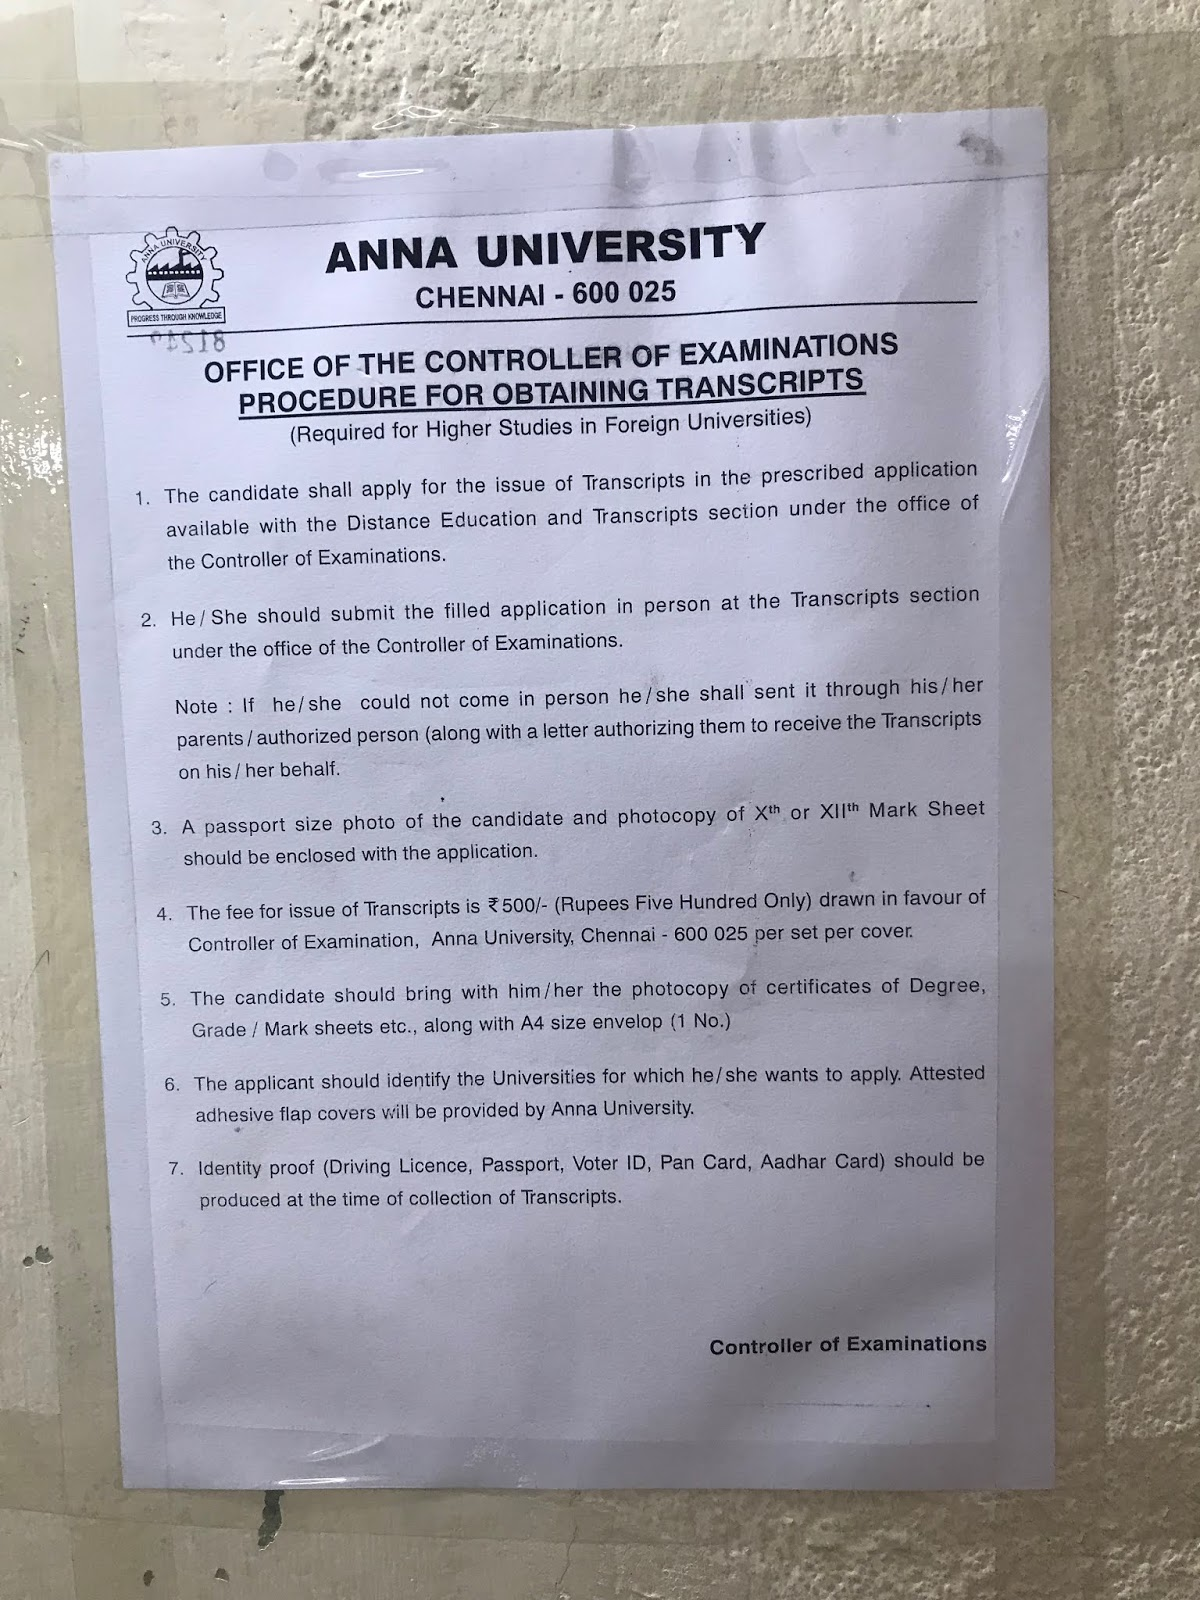 WES Transcript application procedure for Anna University